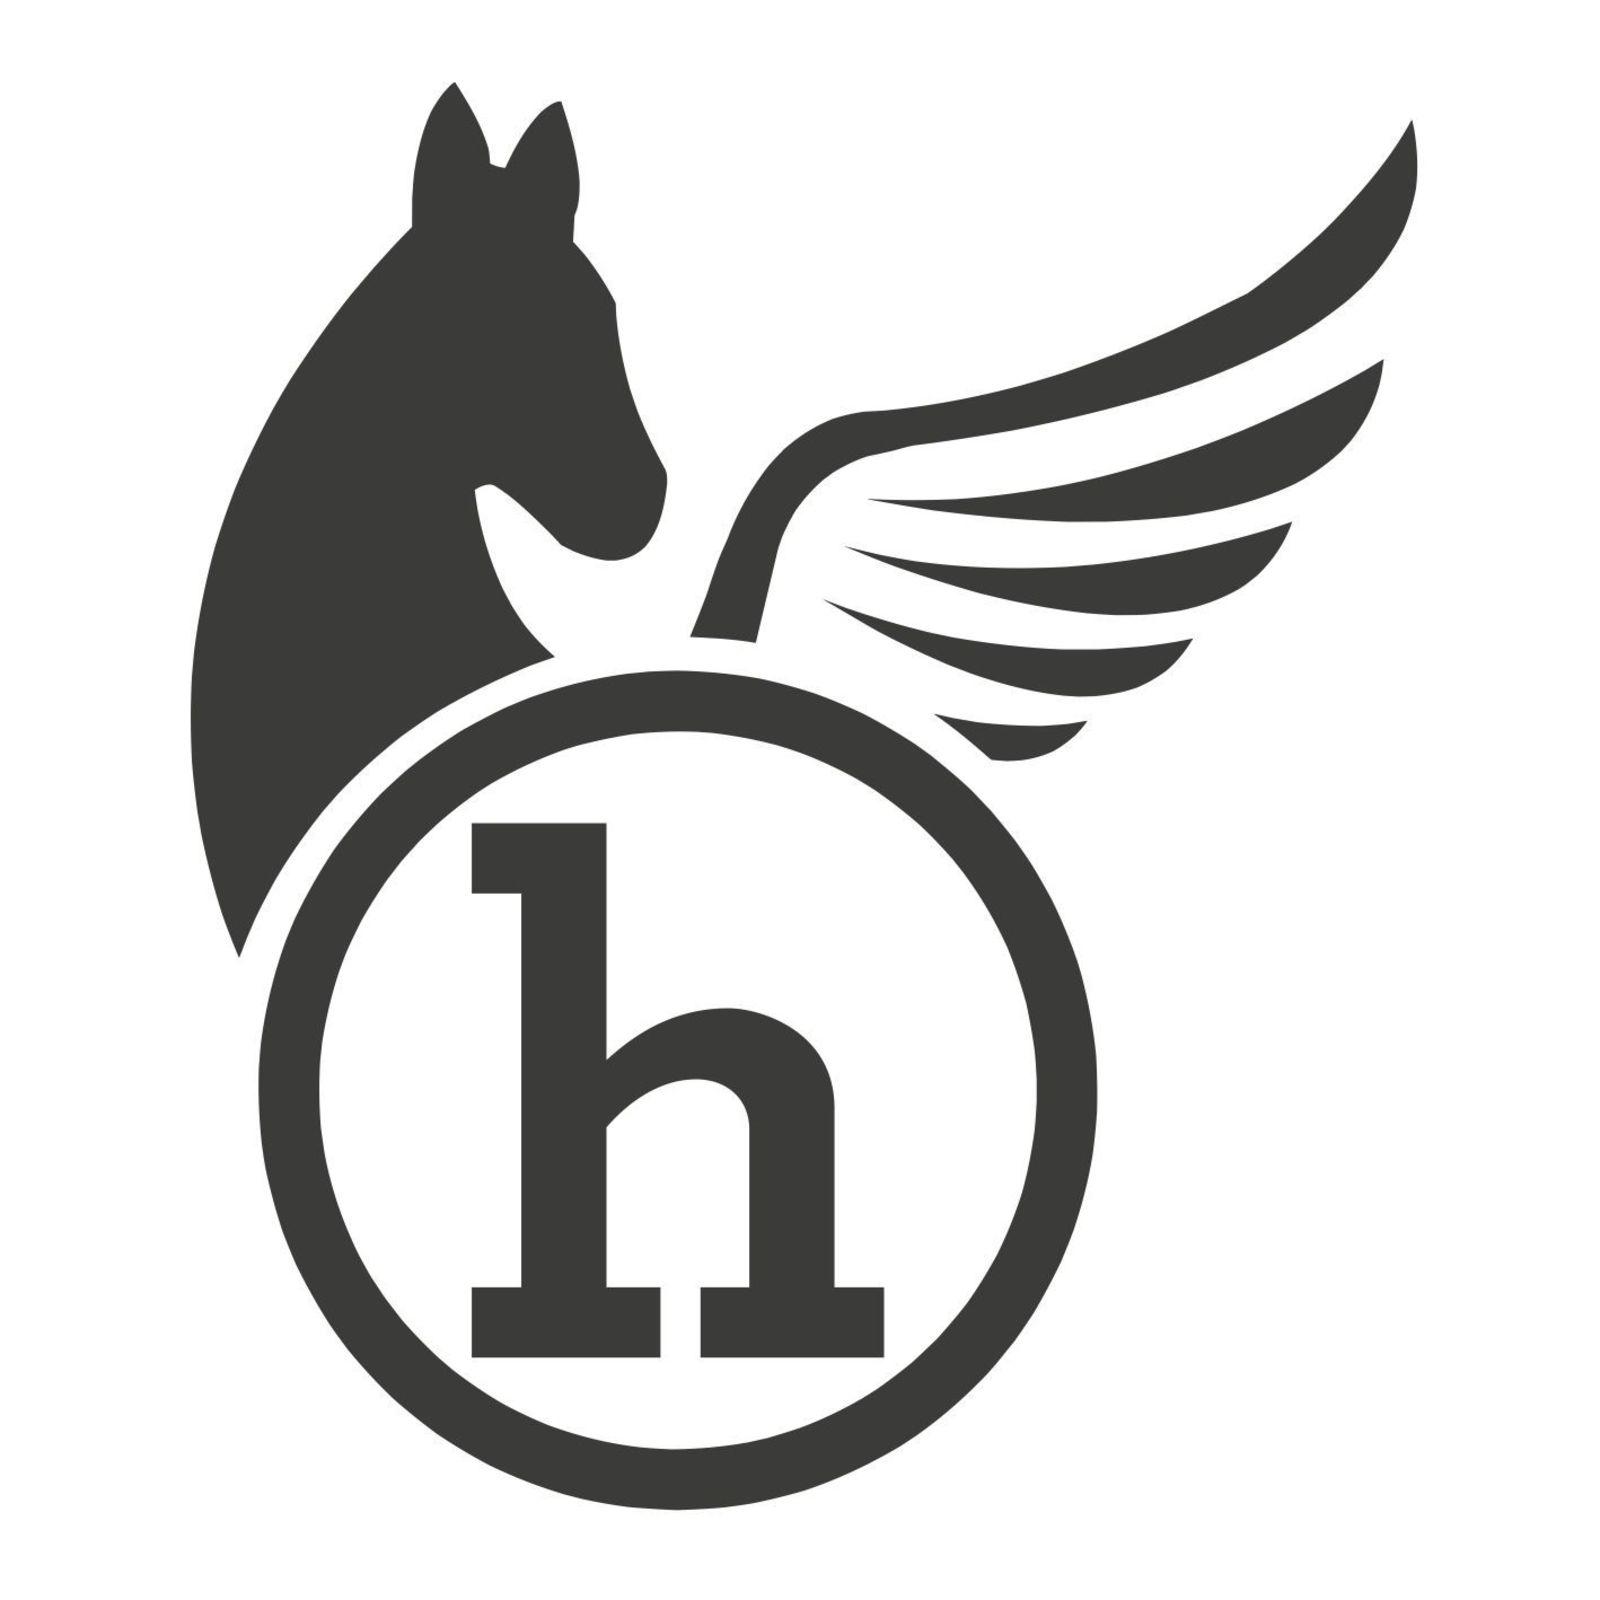 hajo (Bild 1)